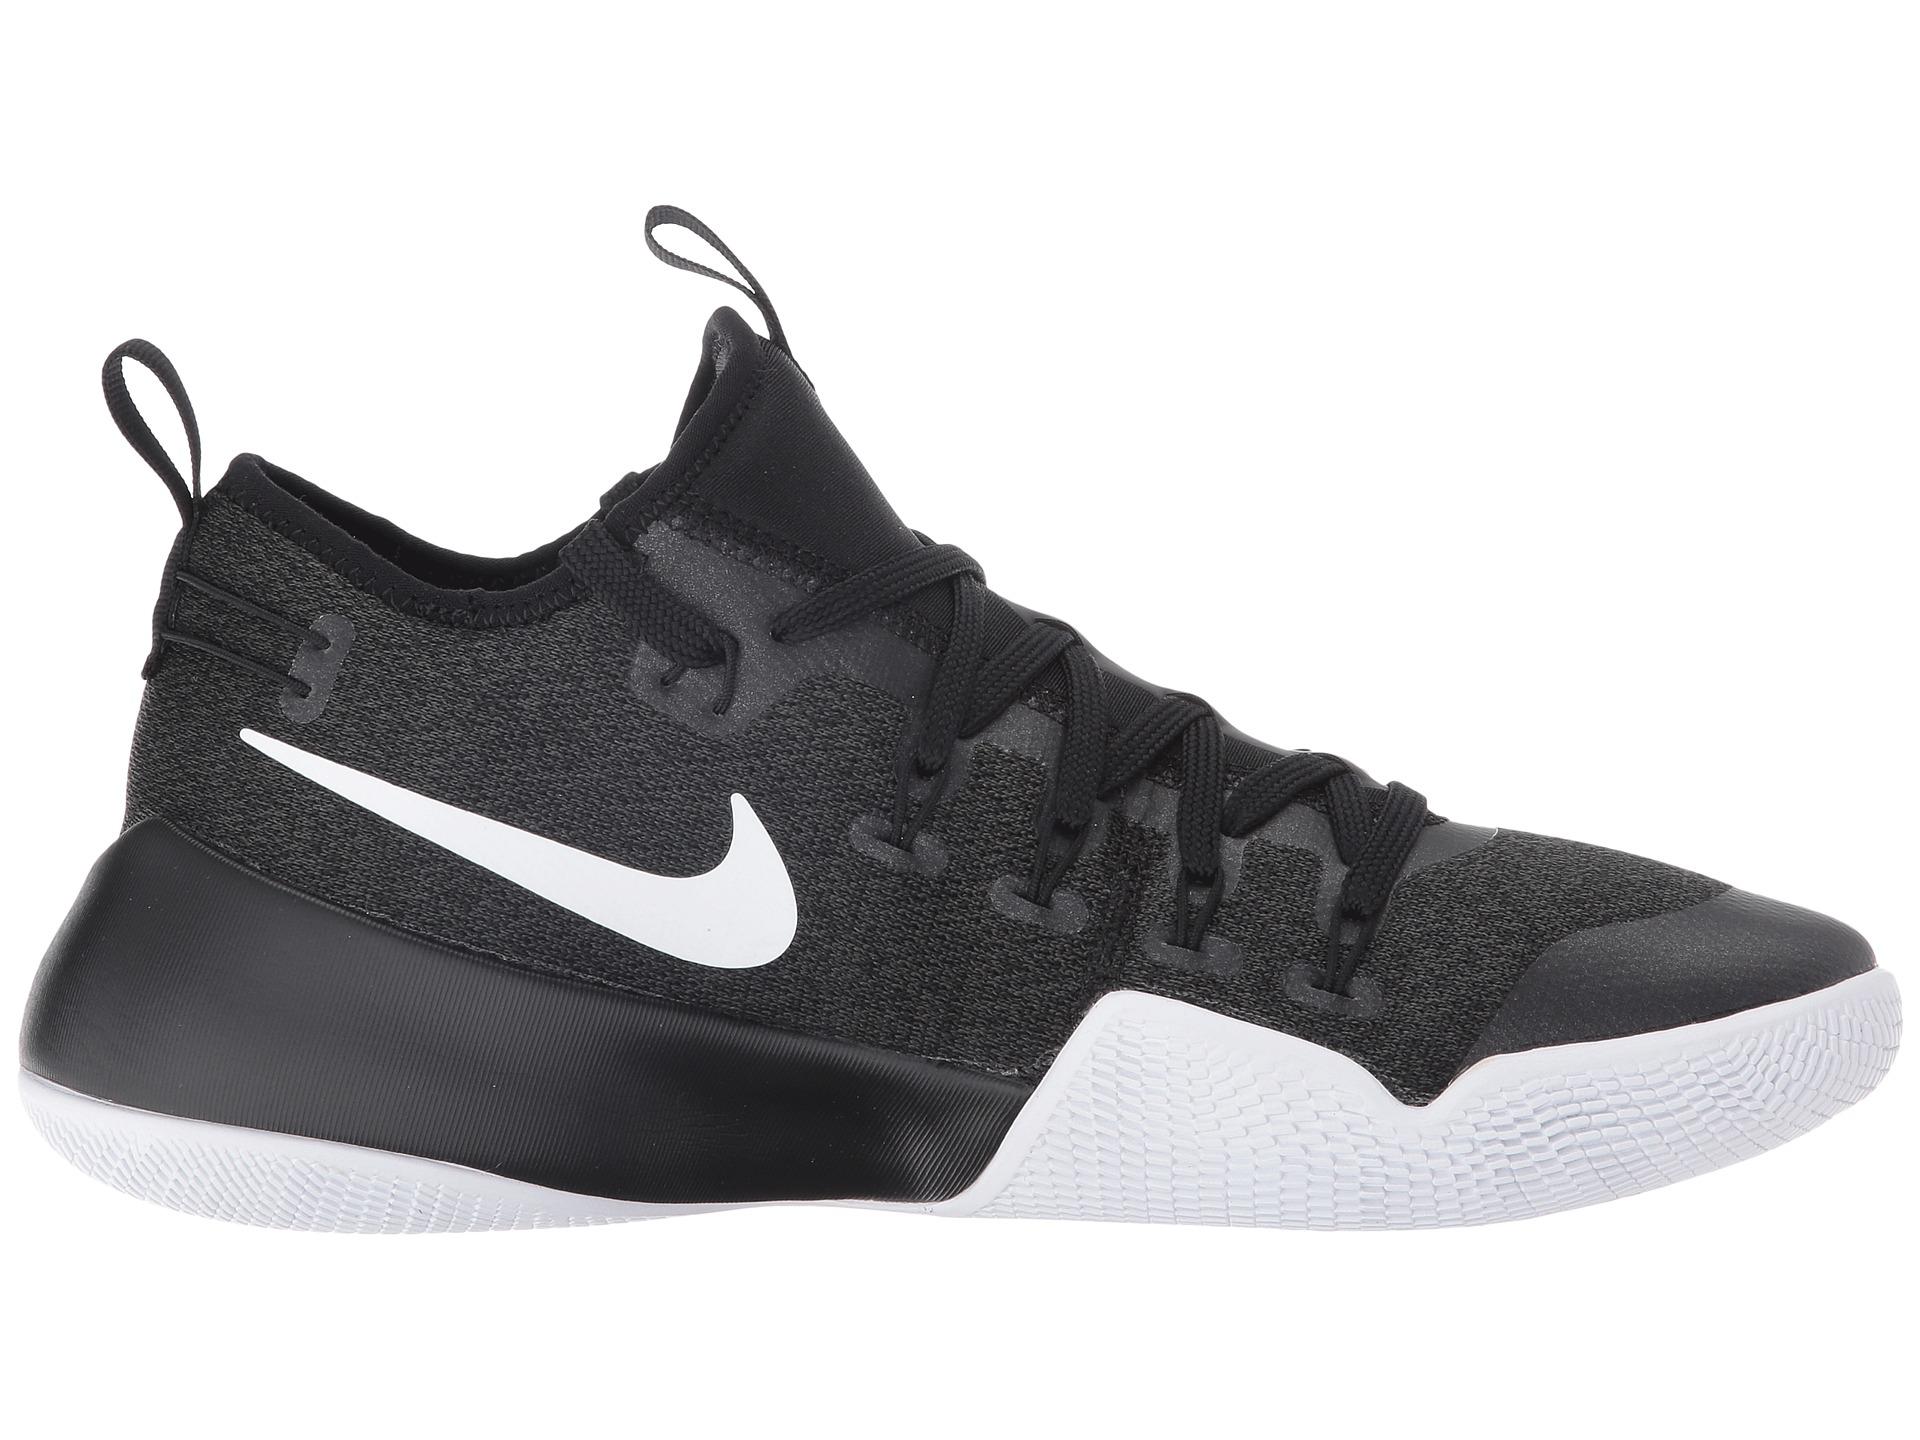 Nike Hypershift Zappos